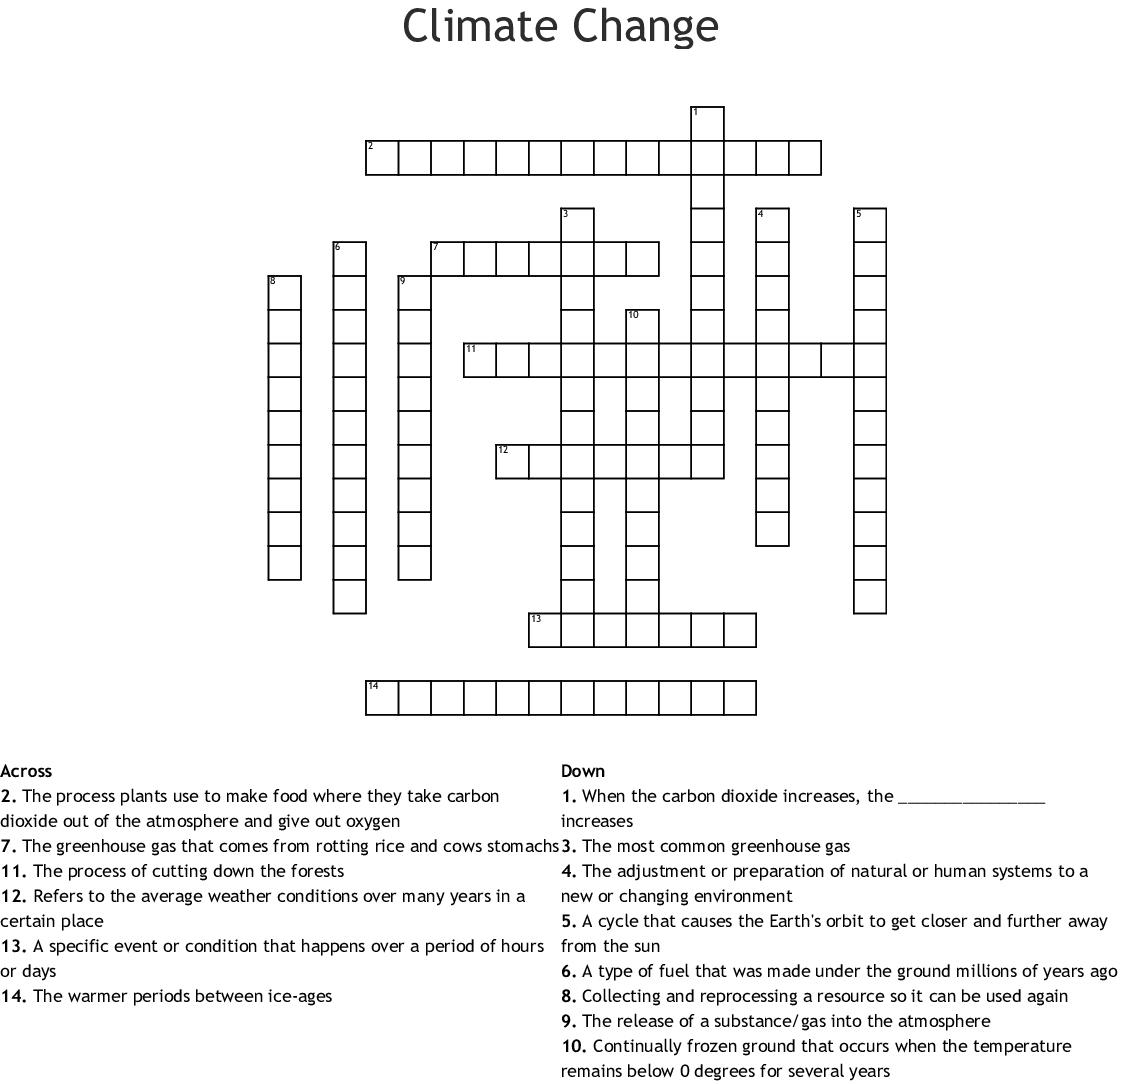 Climate Change Crossword - Wordmint - Printable Weather Crossword Puzzle